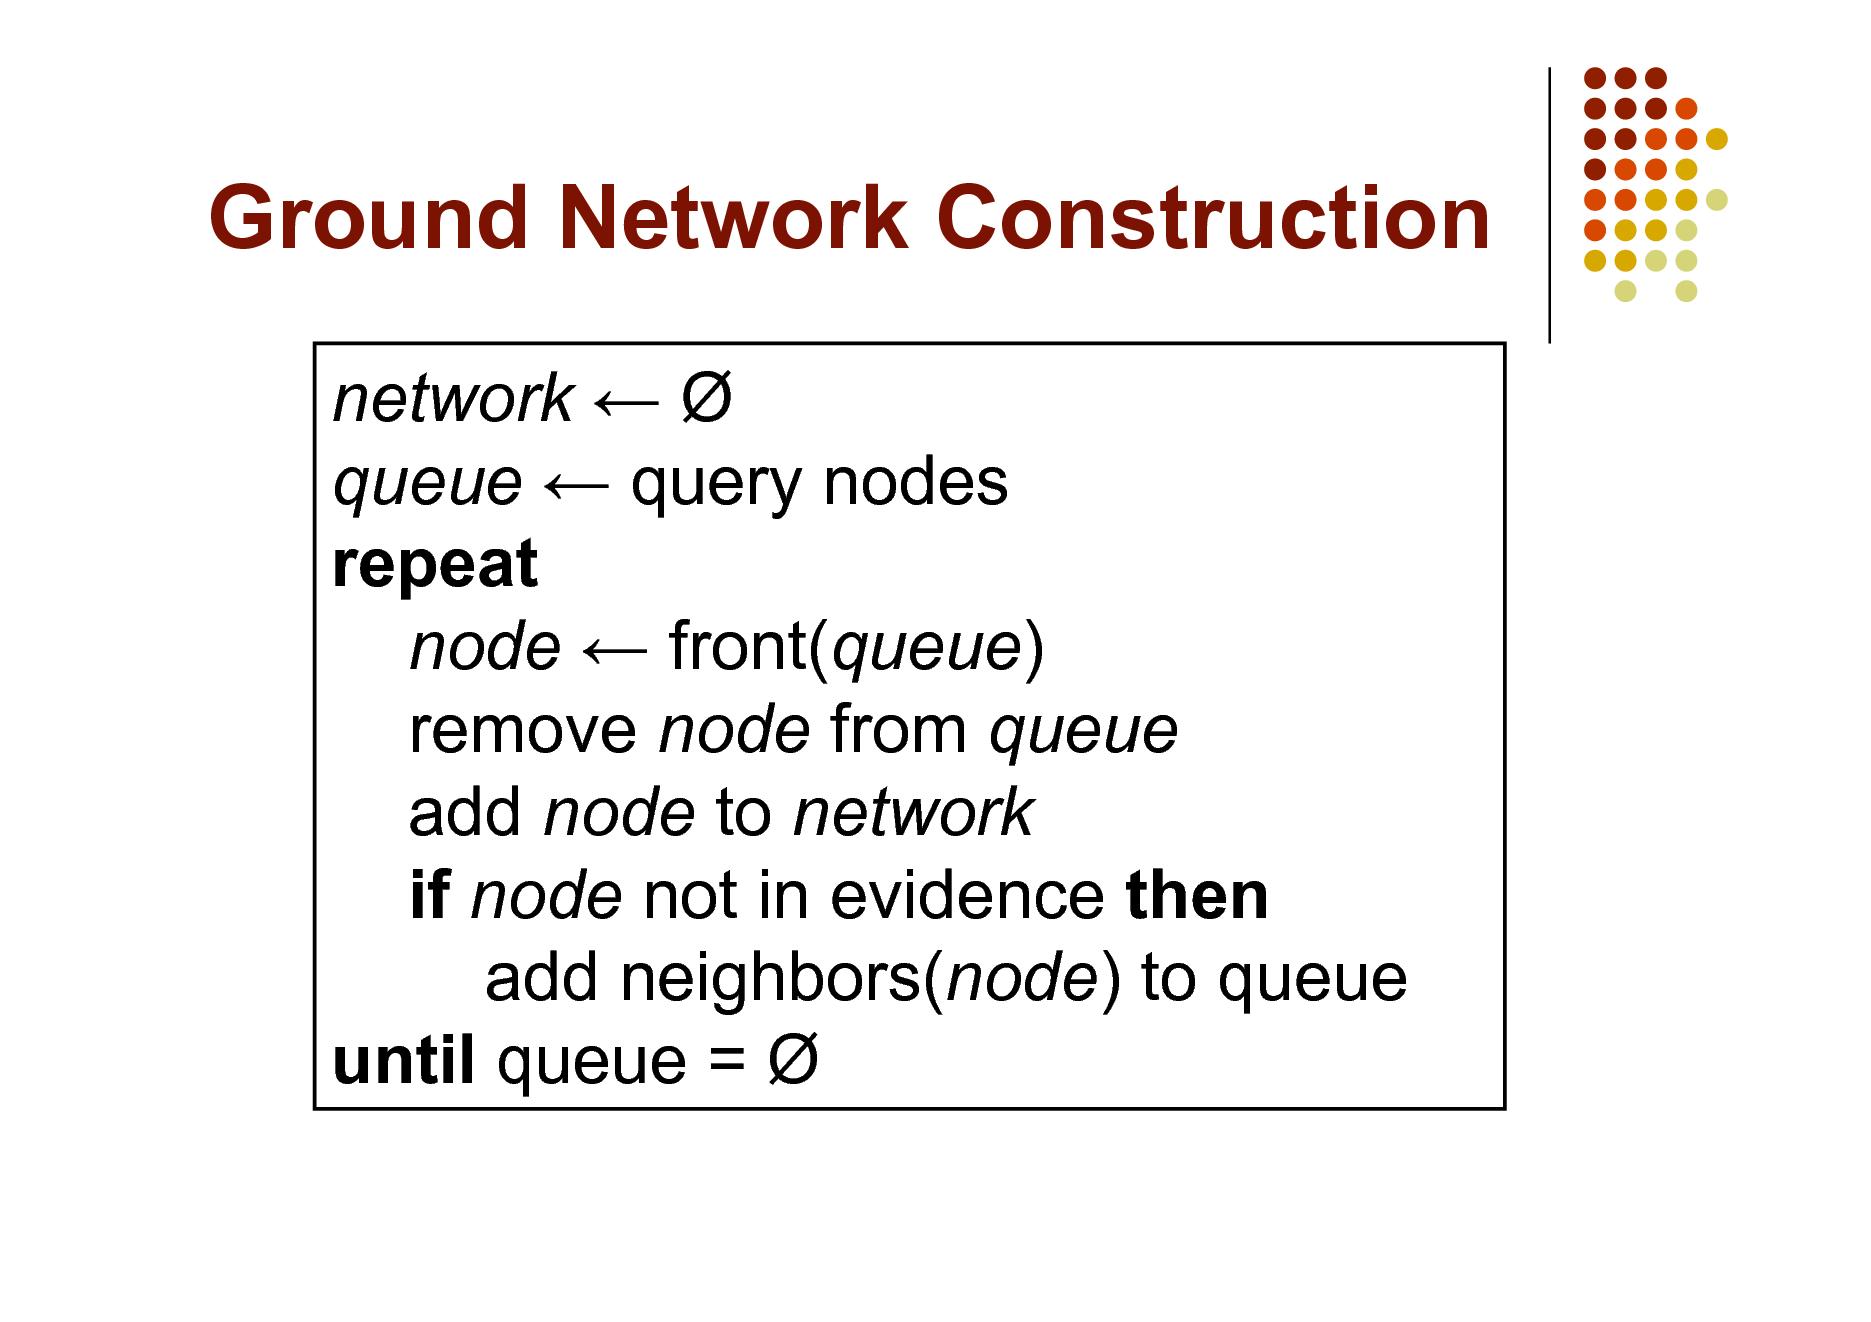 Slide: Ground Network Construction network   queue  query nodes repeat node  front(queue) remove node from queue add node to network if node not in evidence then add neighbors(node) to queue until queue =